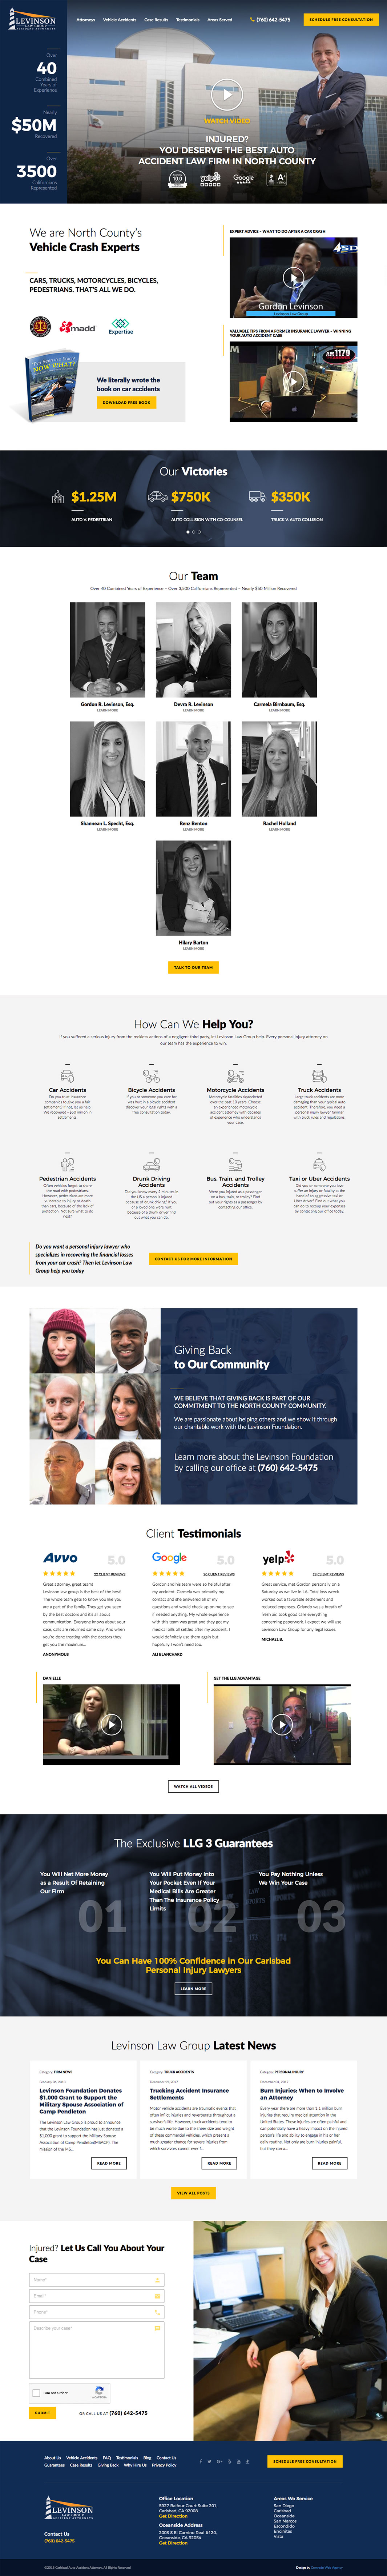 LLG Homepage